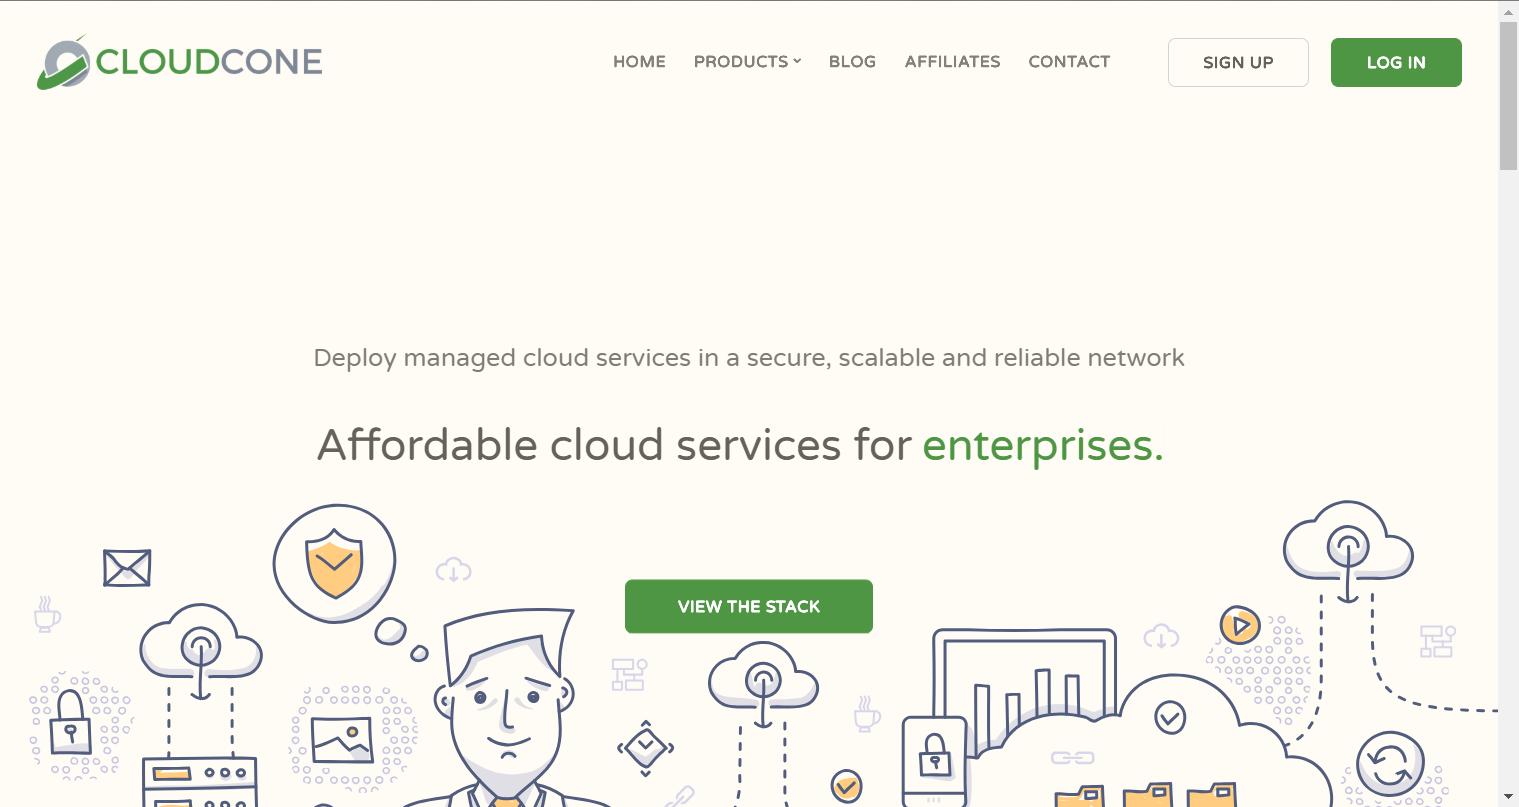 cloudcone.png-Ruanun博客